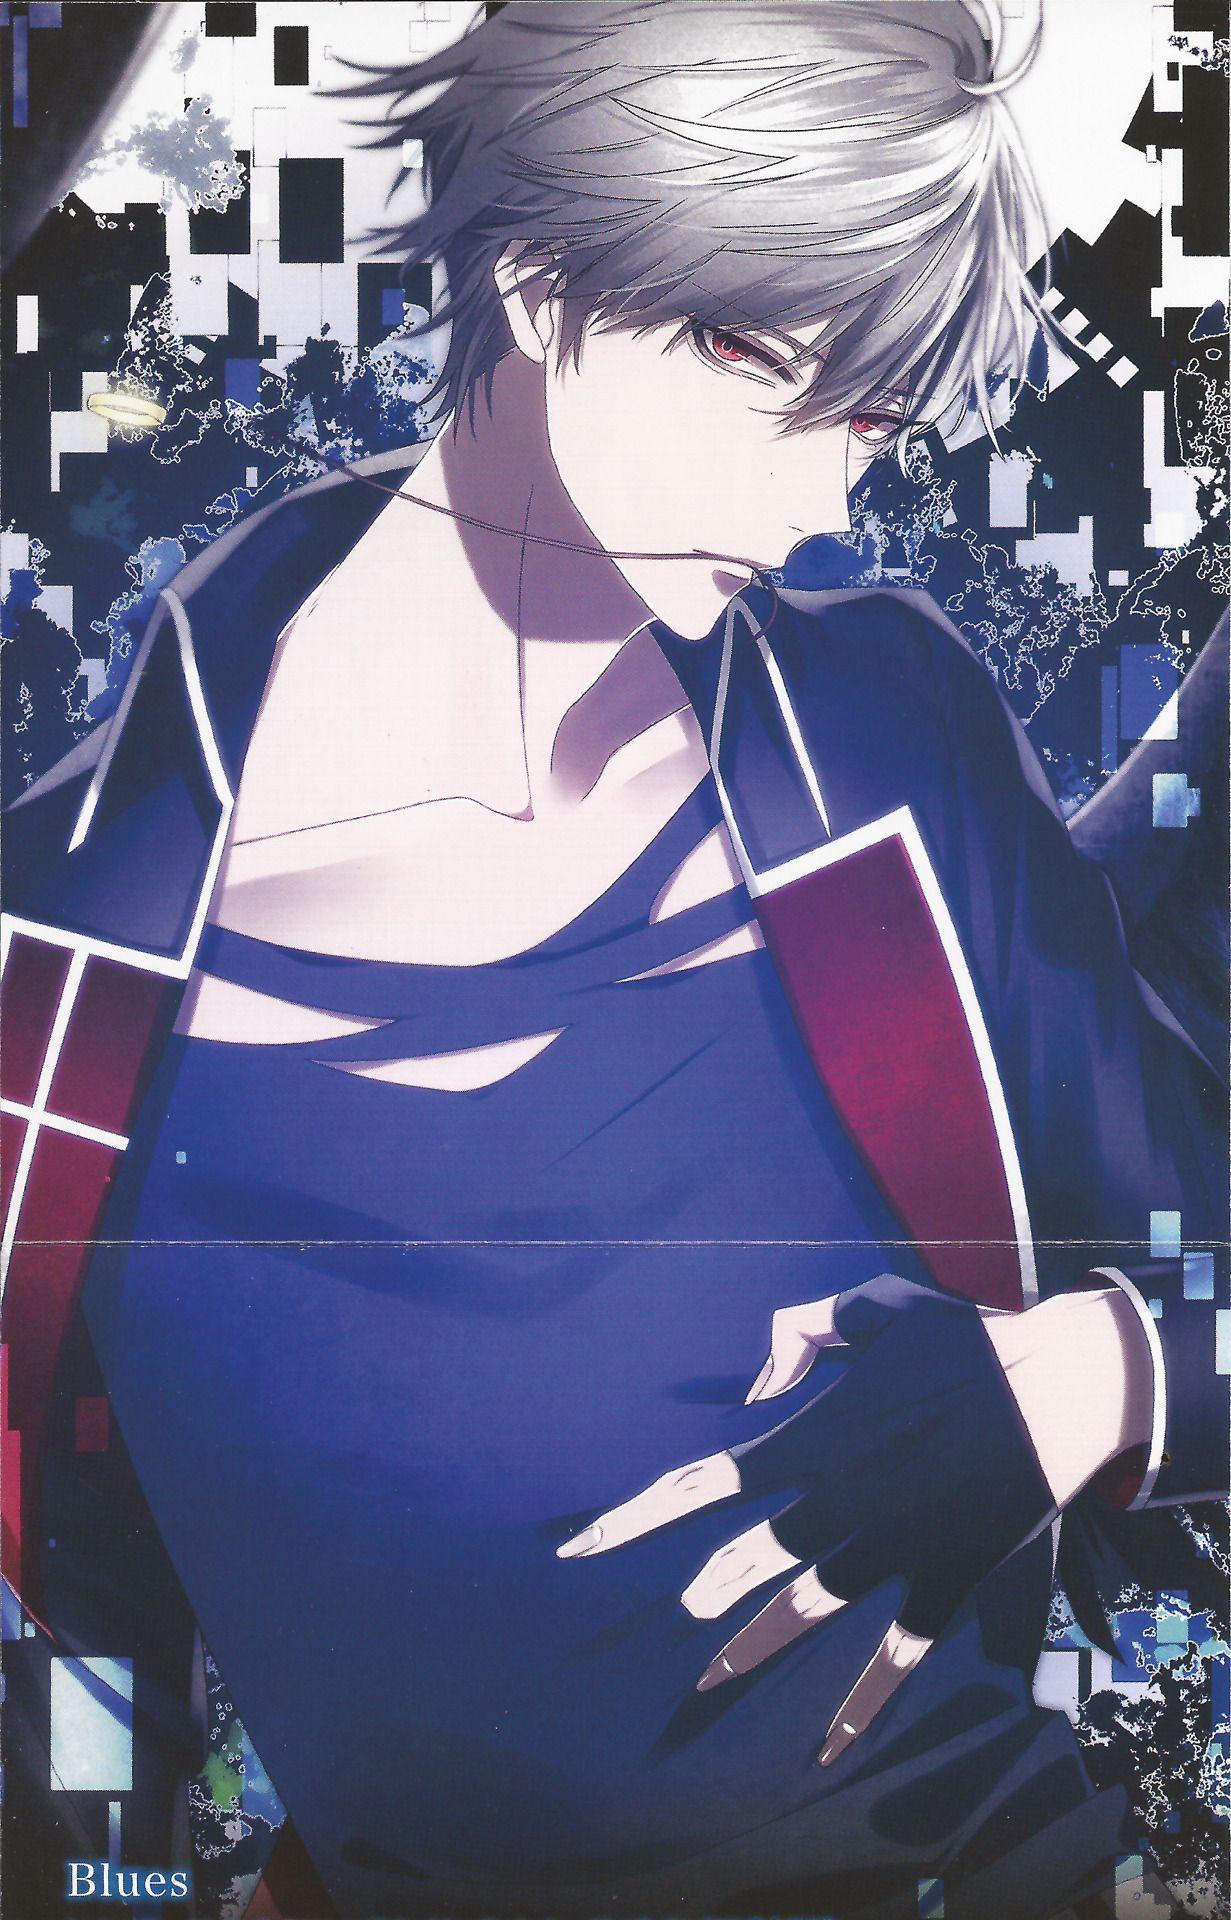 Pin on Anime - Manga - Game - Boys